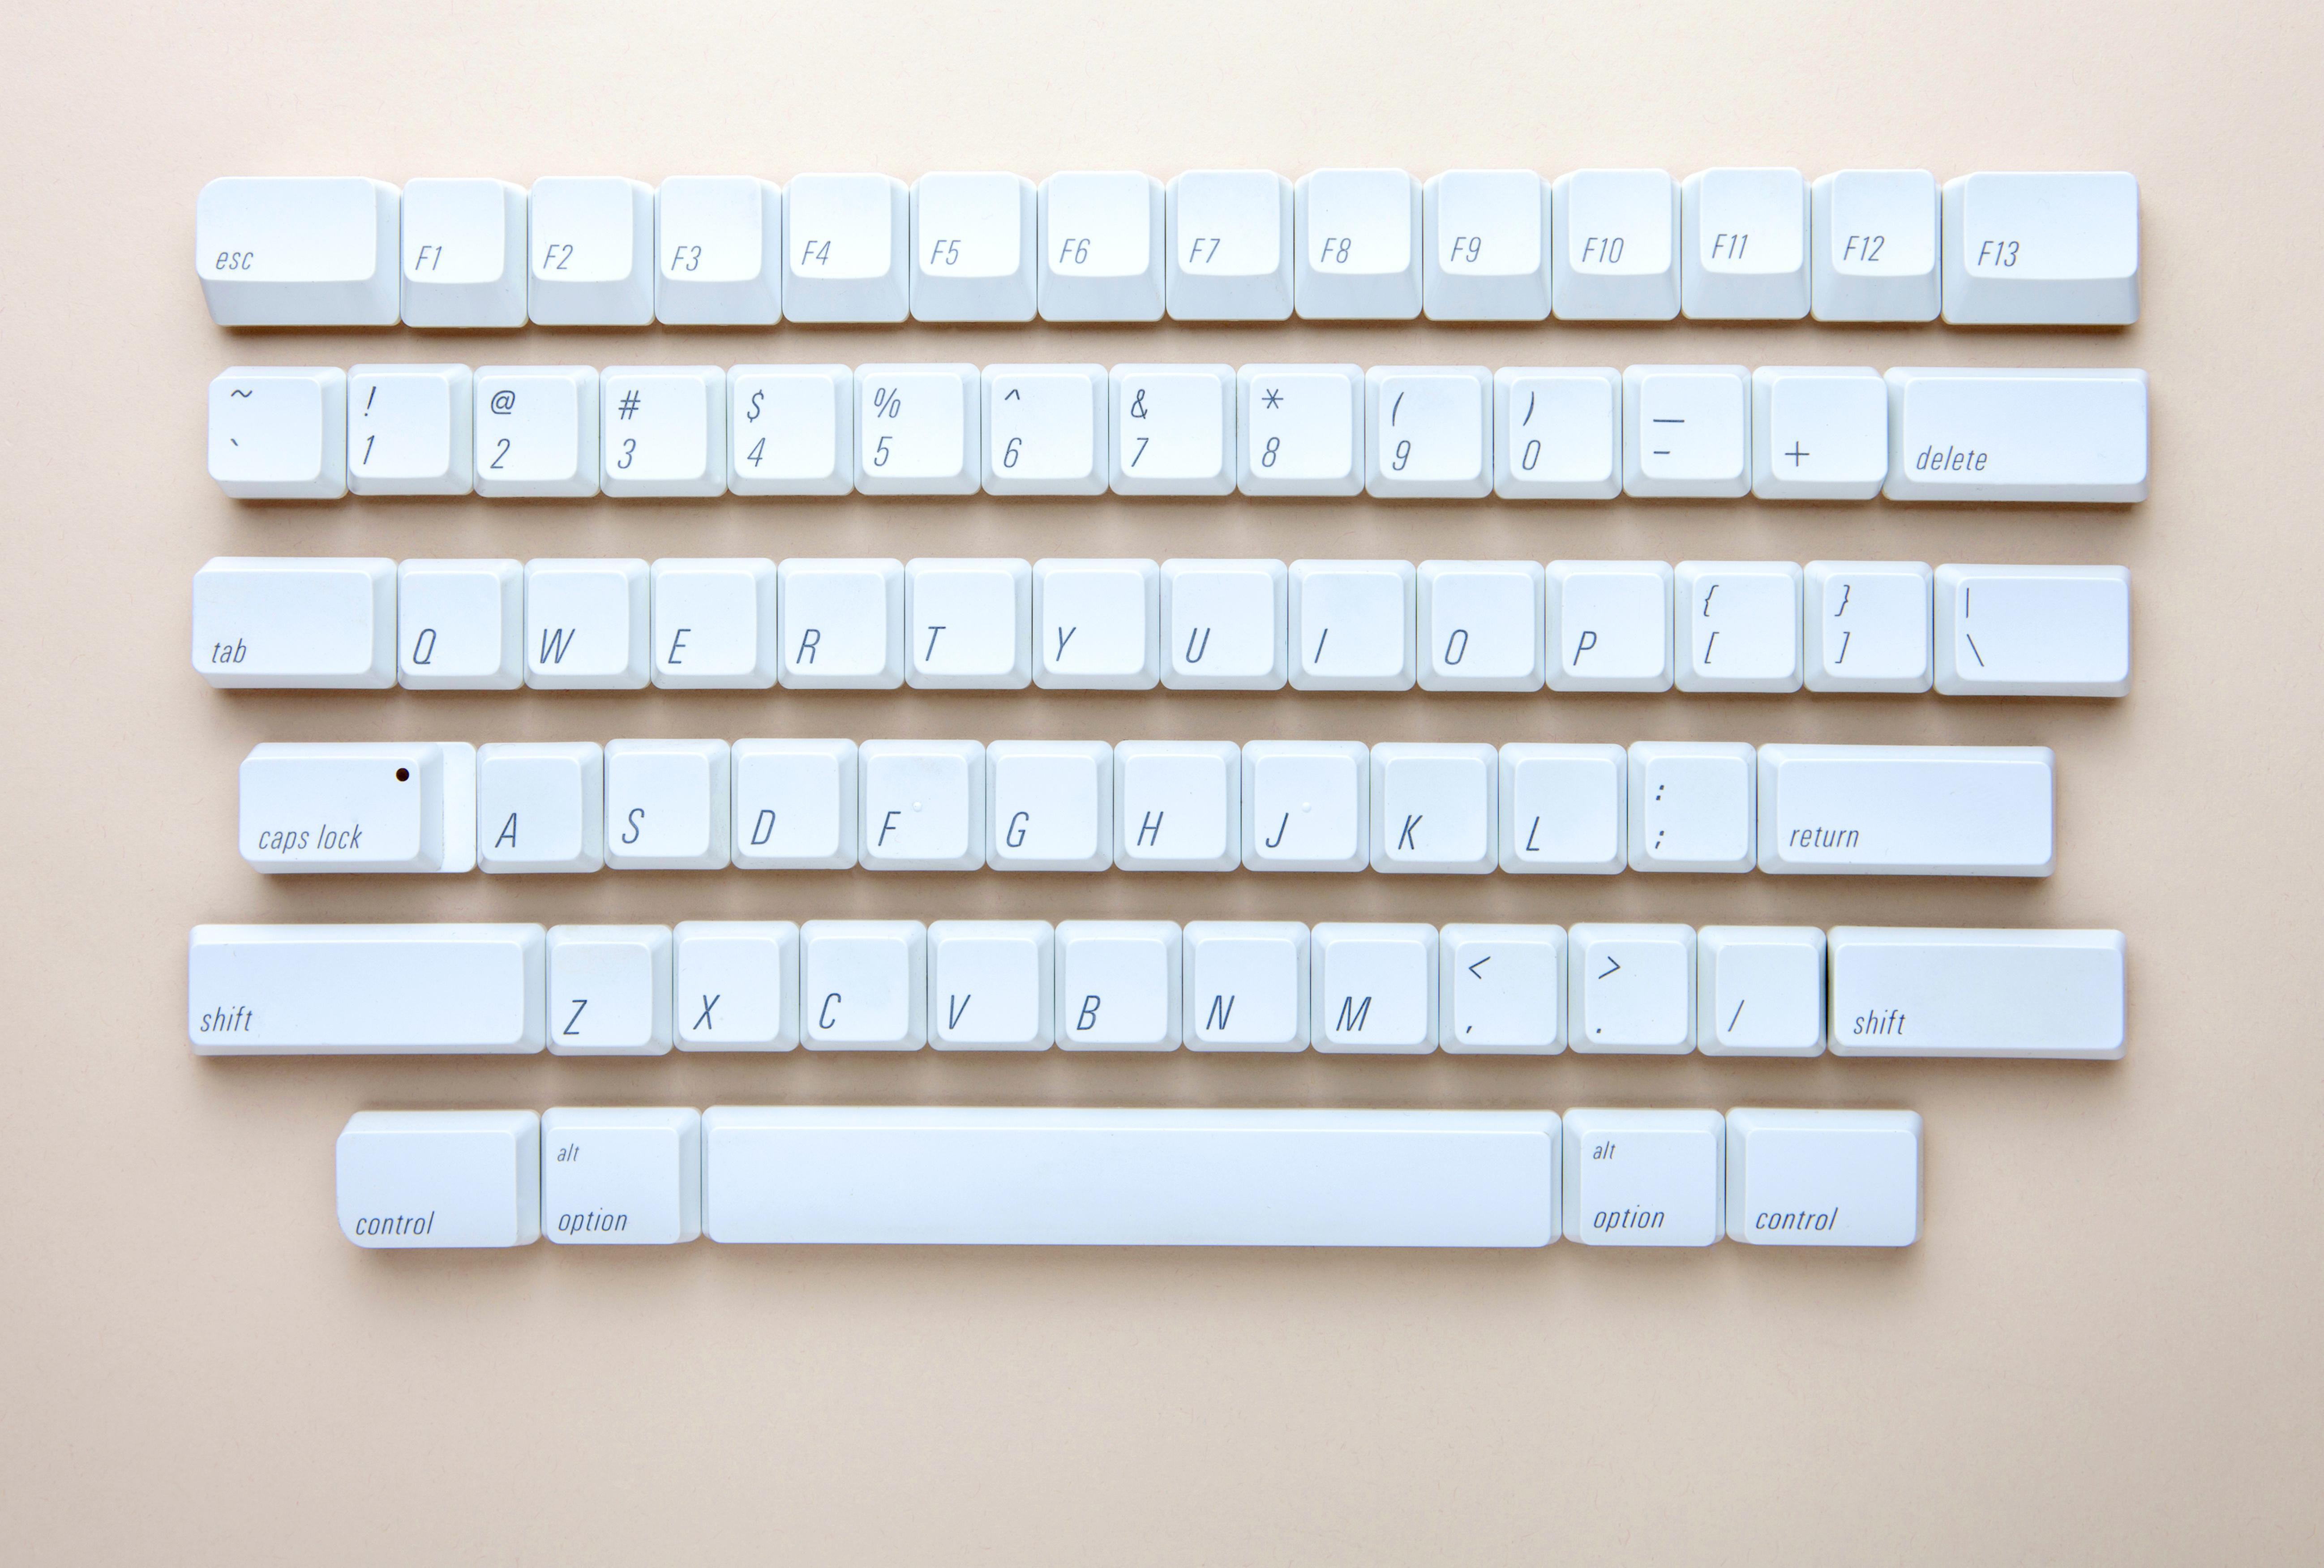 Dismantled keyboard on pink background.